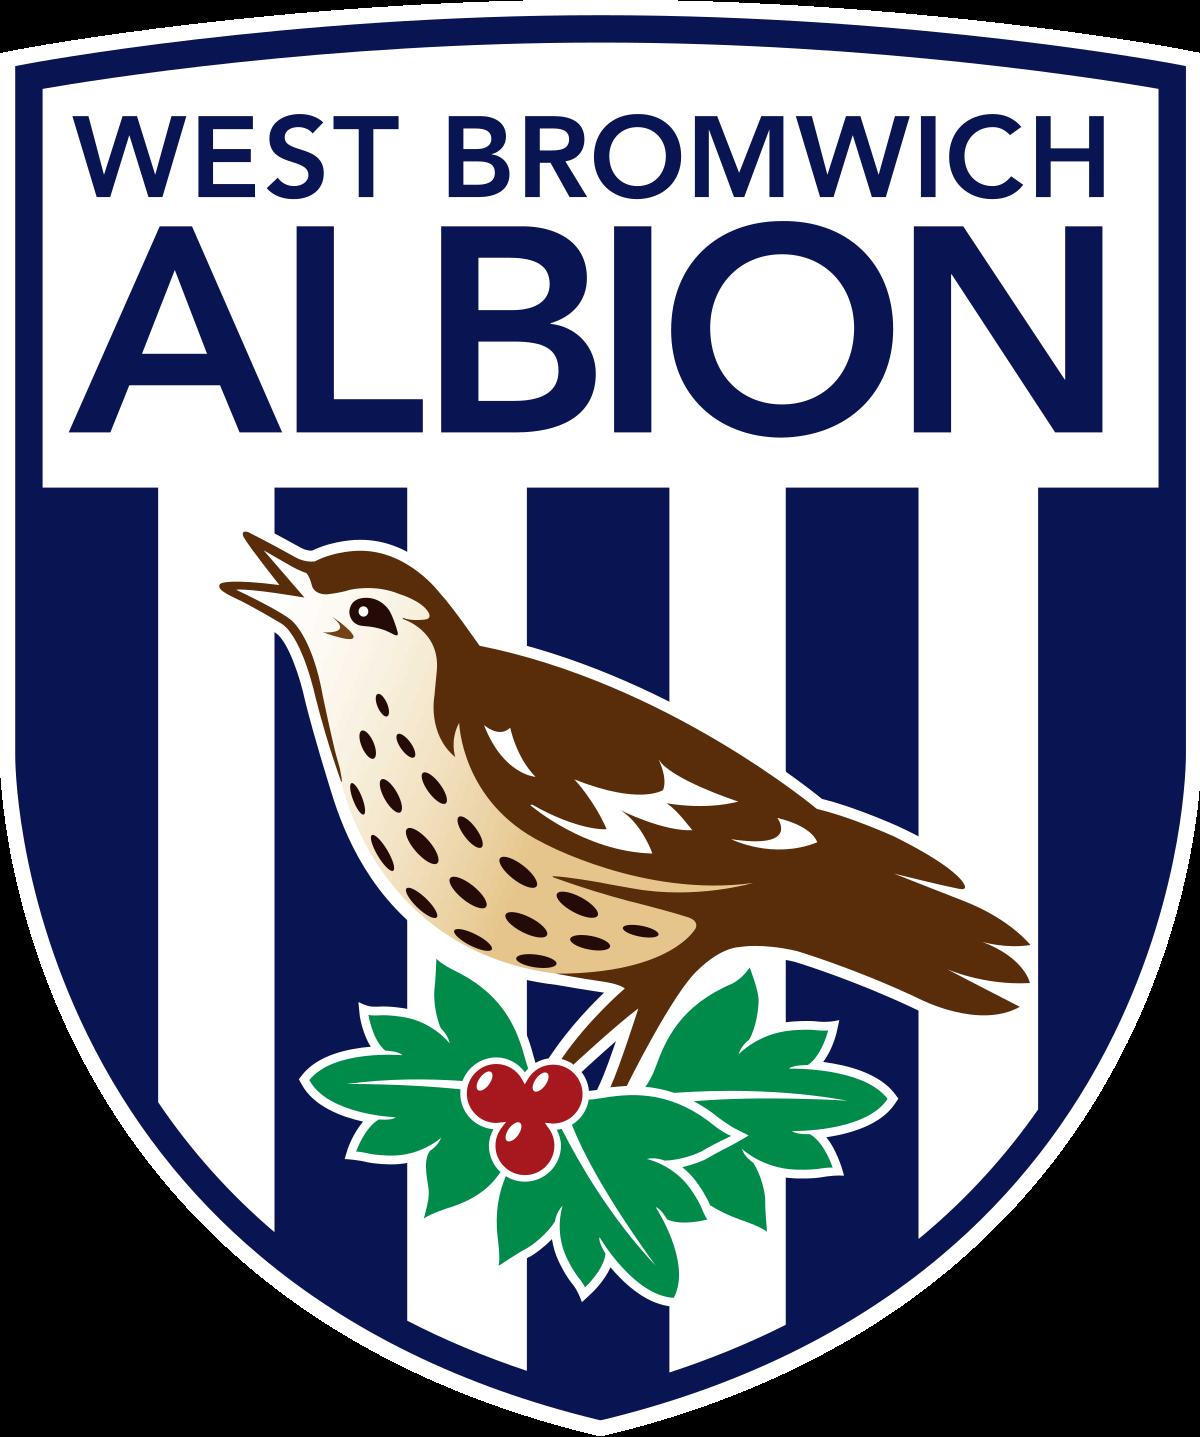 West Brom U-18 logo